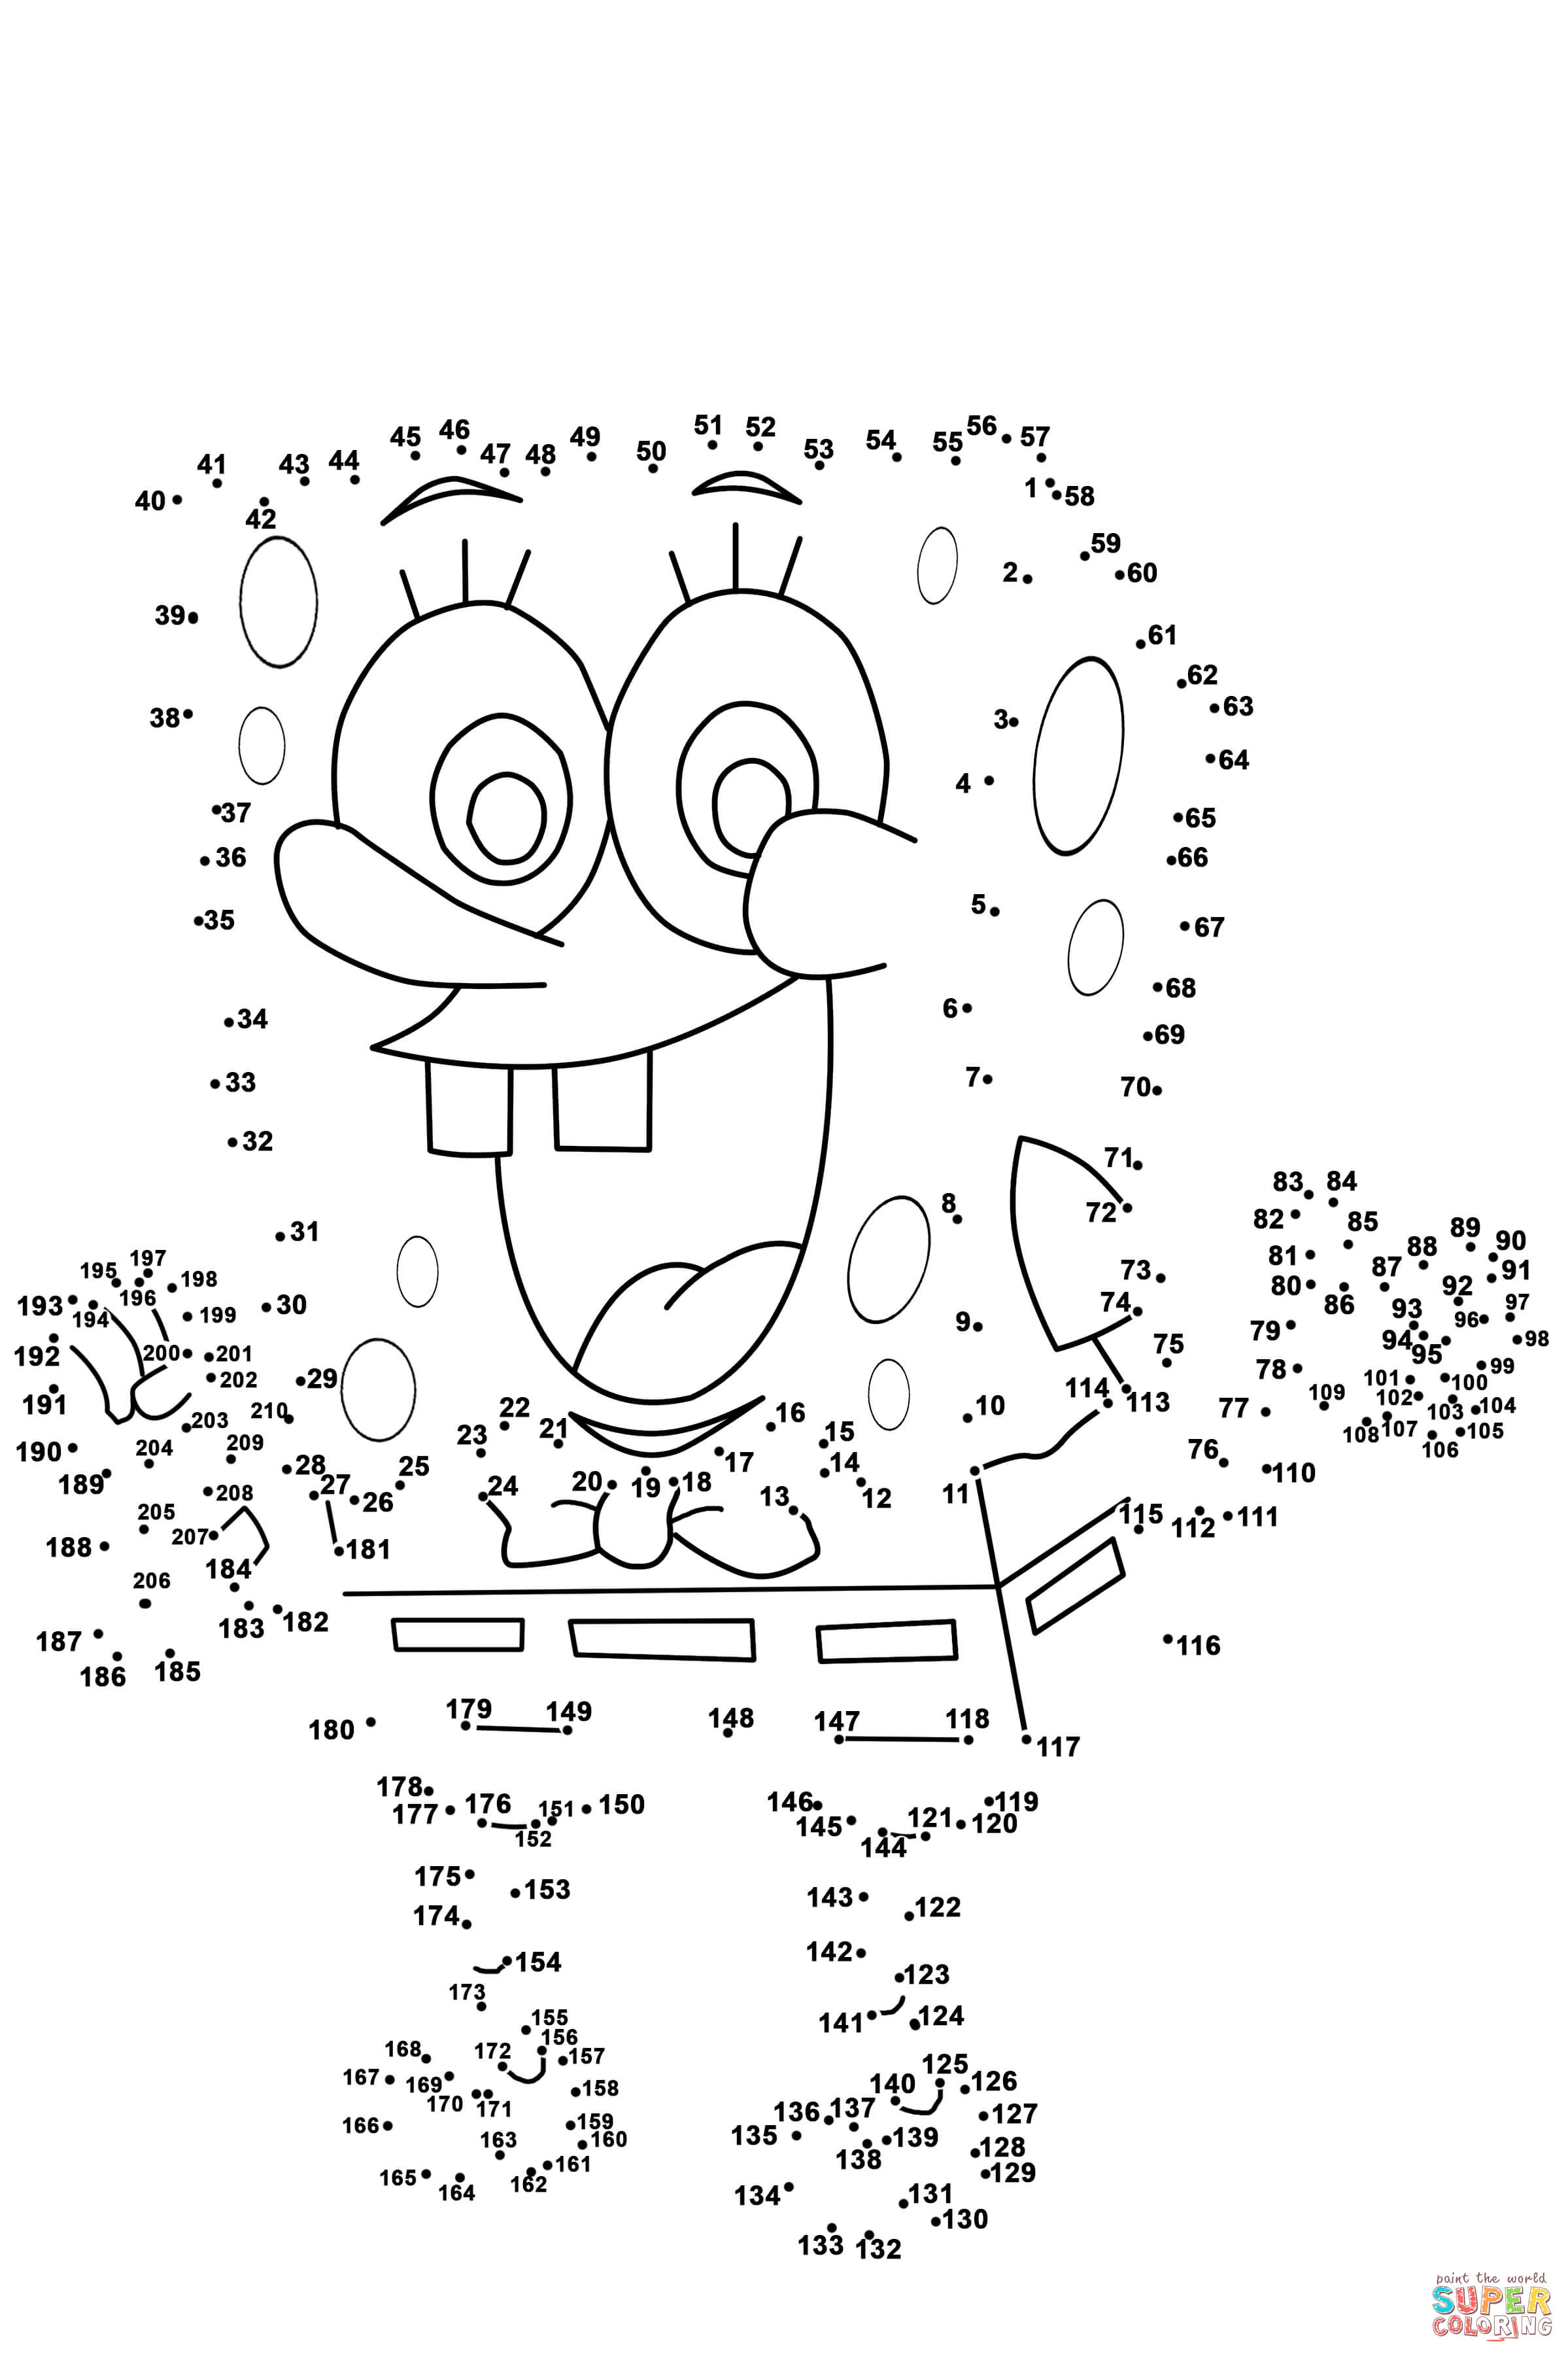 Spongebob Dot To Dot | Free Printable Coloring Pages - Free Printable Dot To Dot